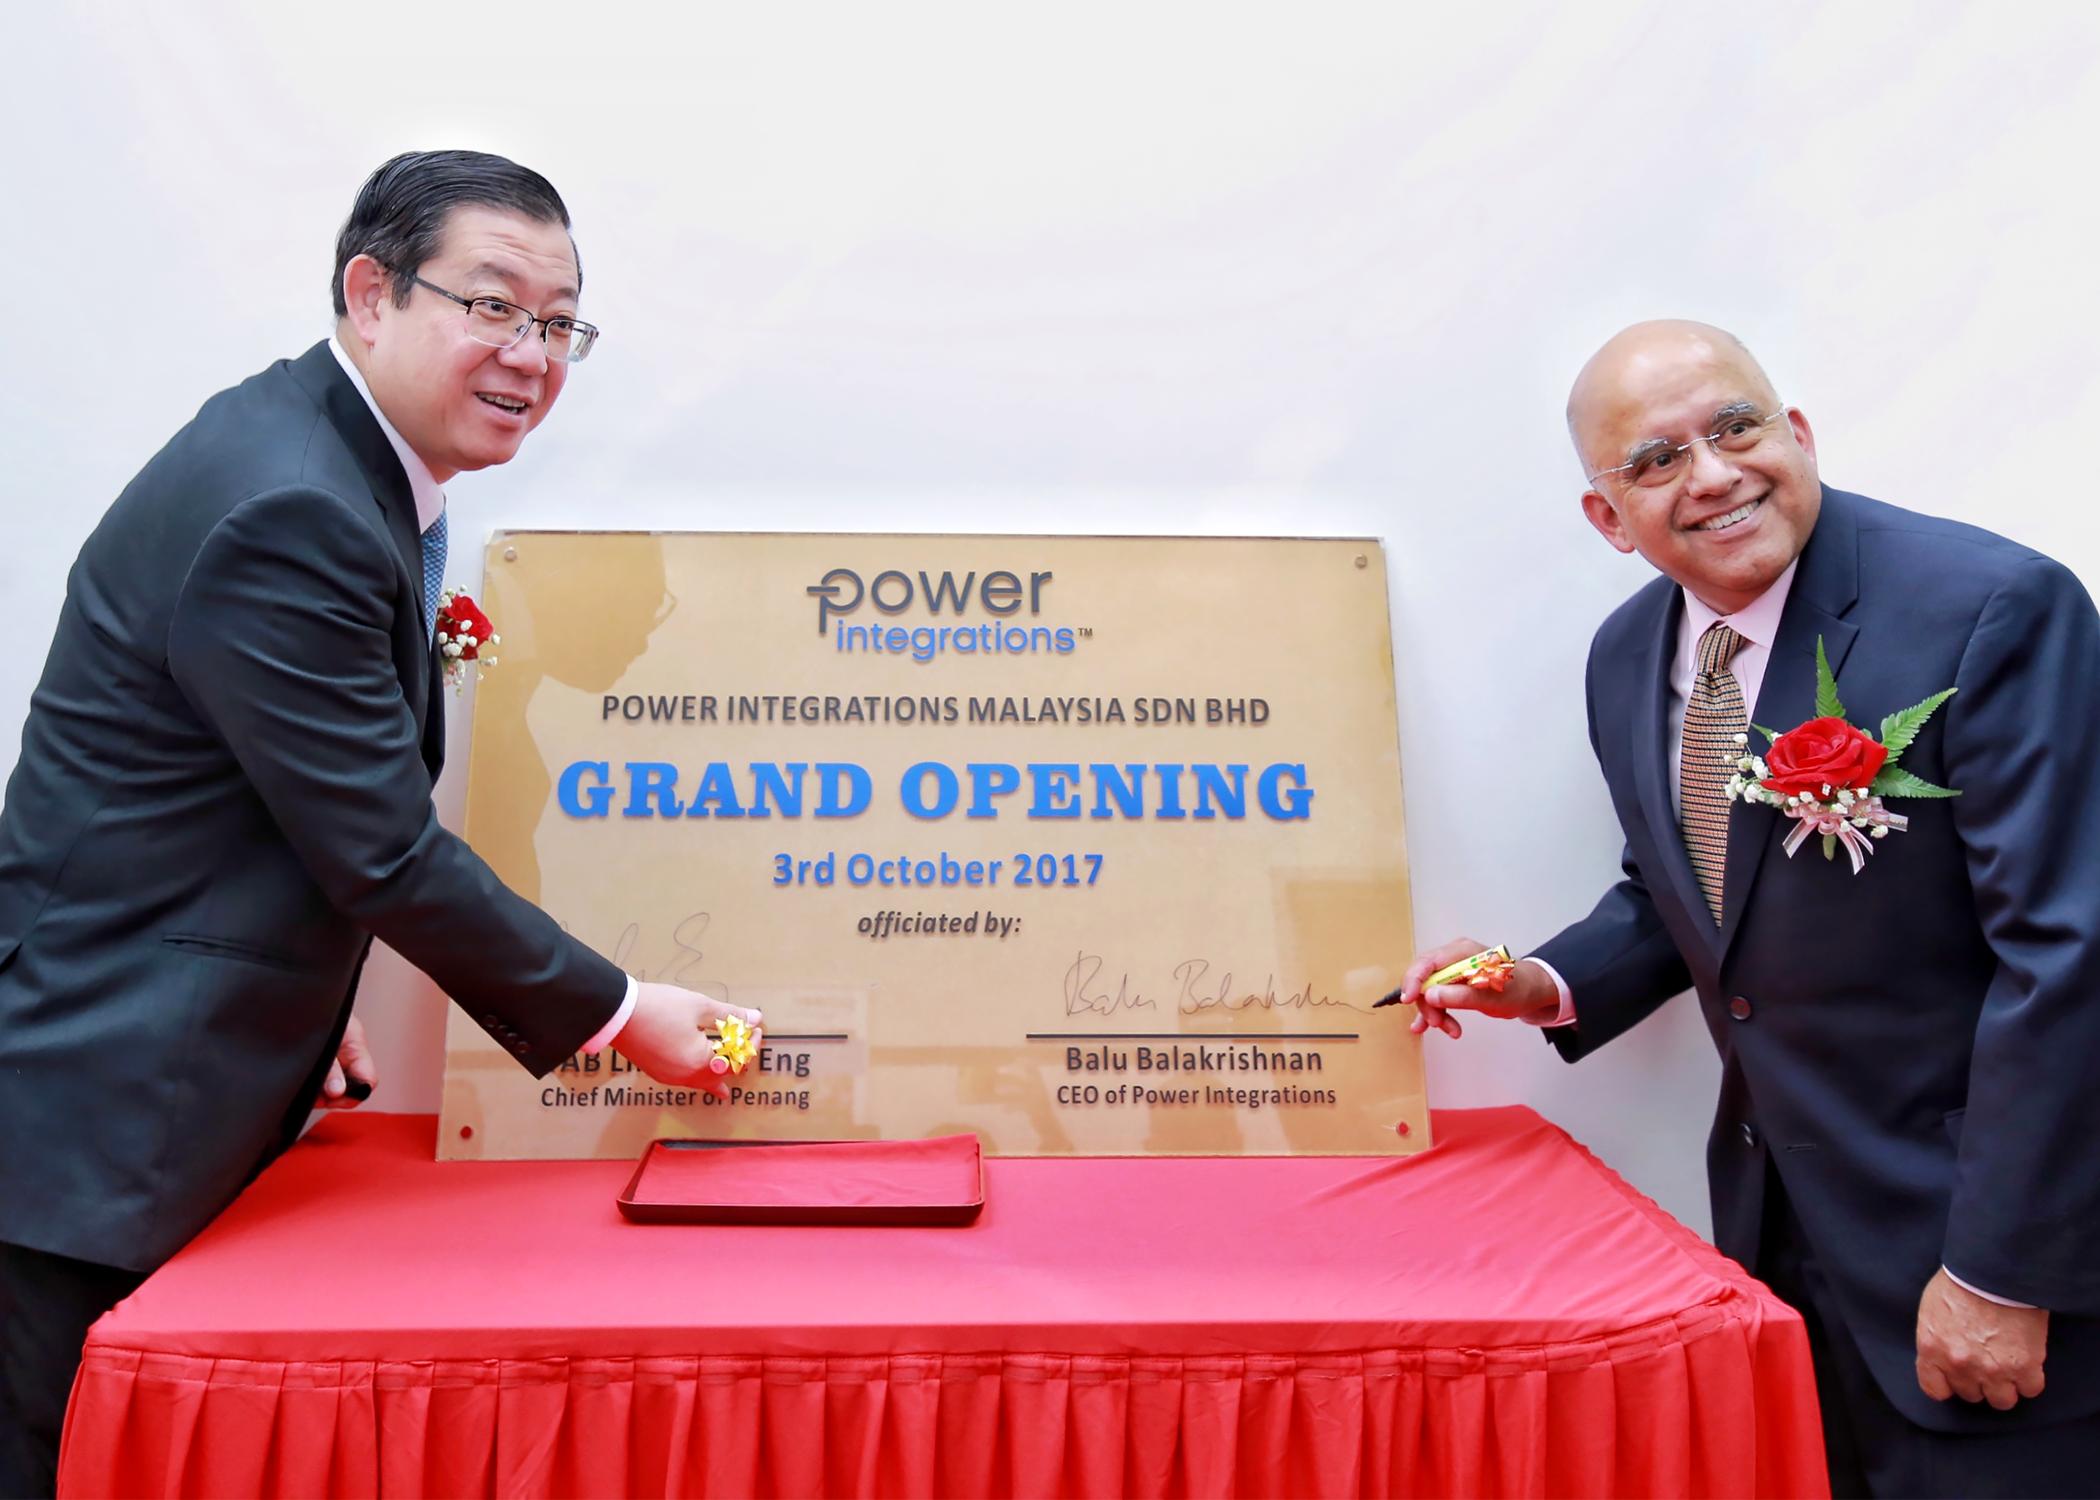 Power Integrations在馬來西亞設立生產支持與研發中心, 以期擴大在亞洲的業務范圍